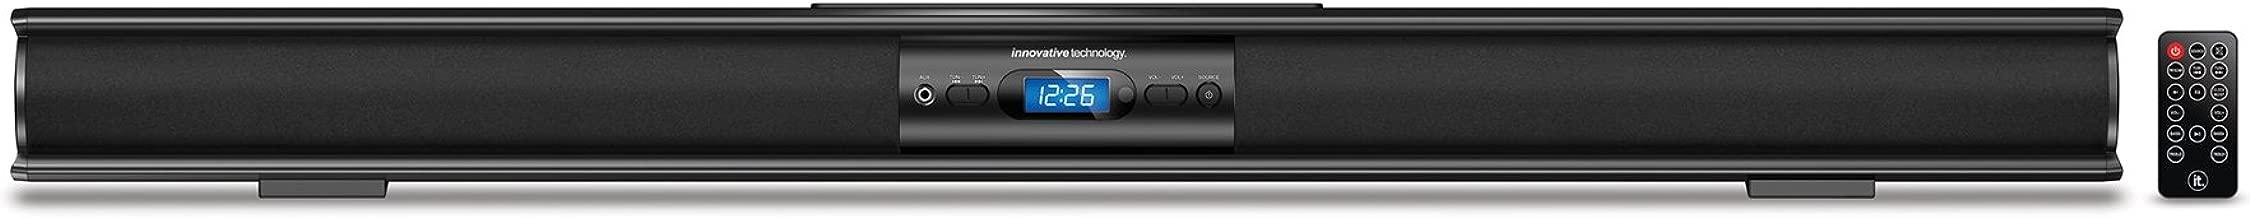 Innovative Technology Low-profile 37-Inch Bluetooth Stereo Soundbar, Black